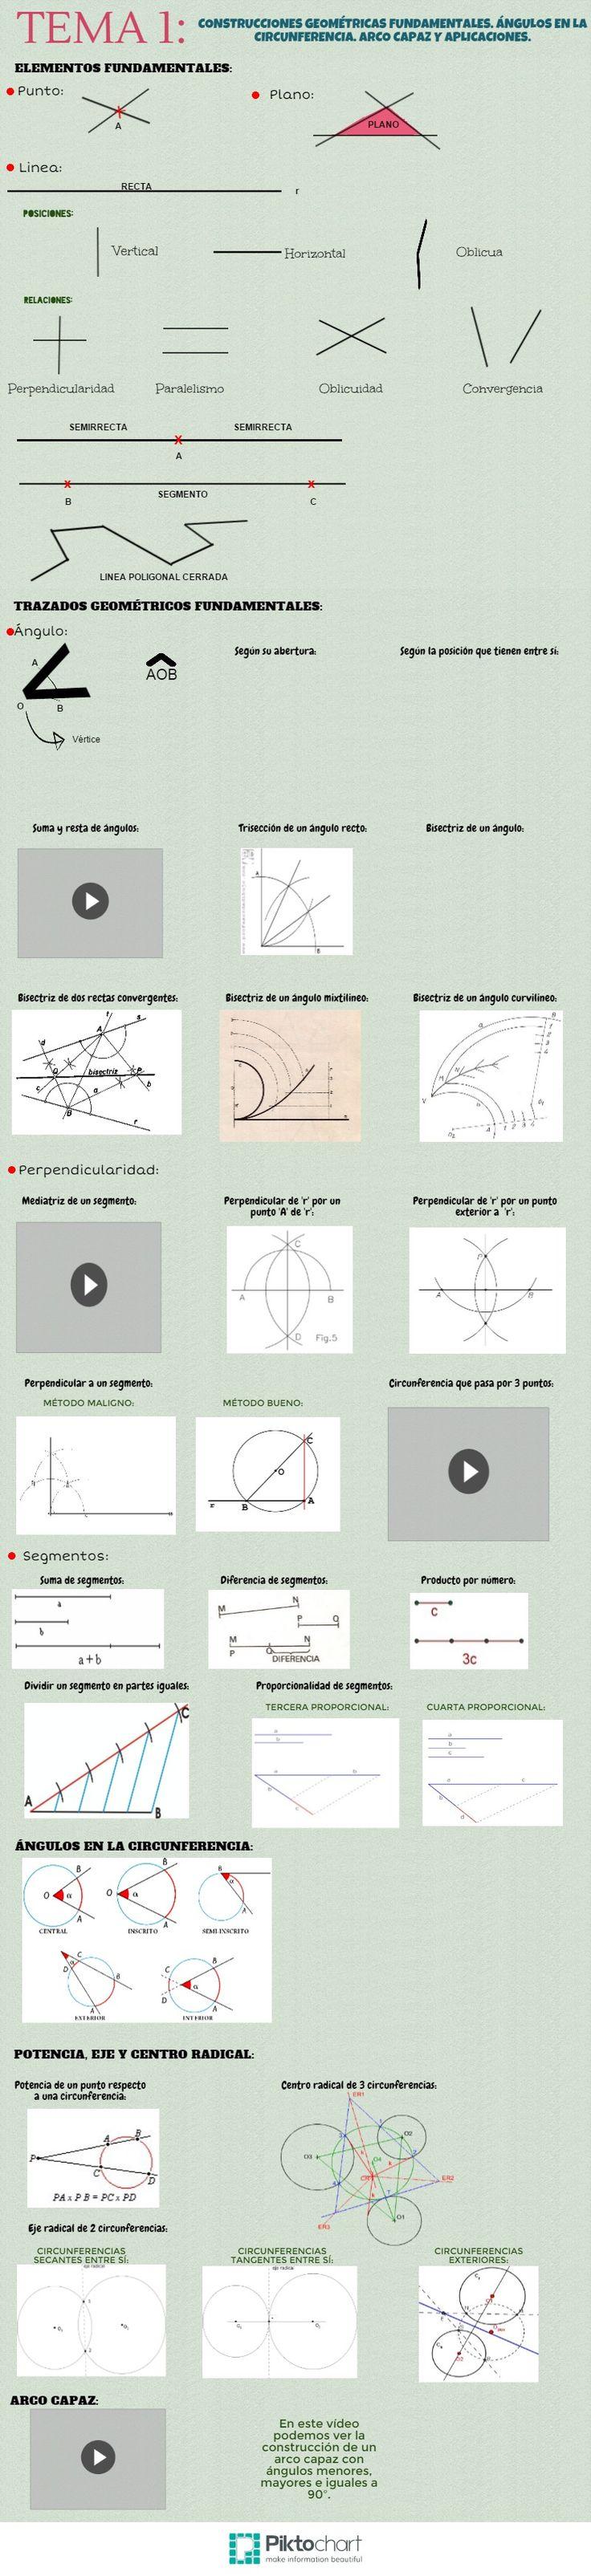 PIKTOCHART >> http://piktochart.com/. Programa para hacer infografías. Ejemplo de infografía de dibujo técnico, trazados fundamentales.